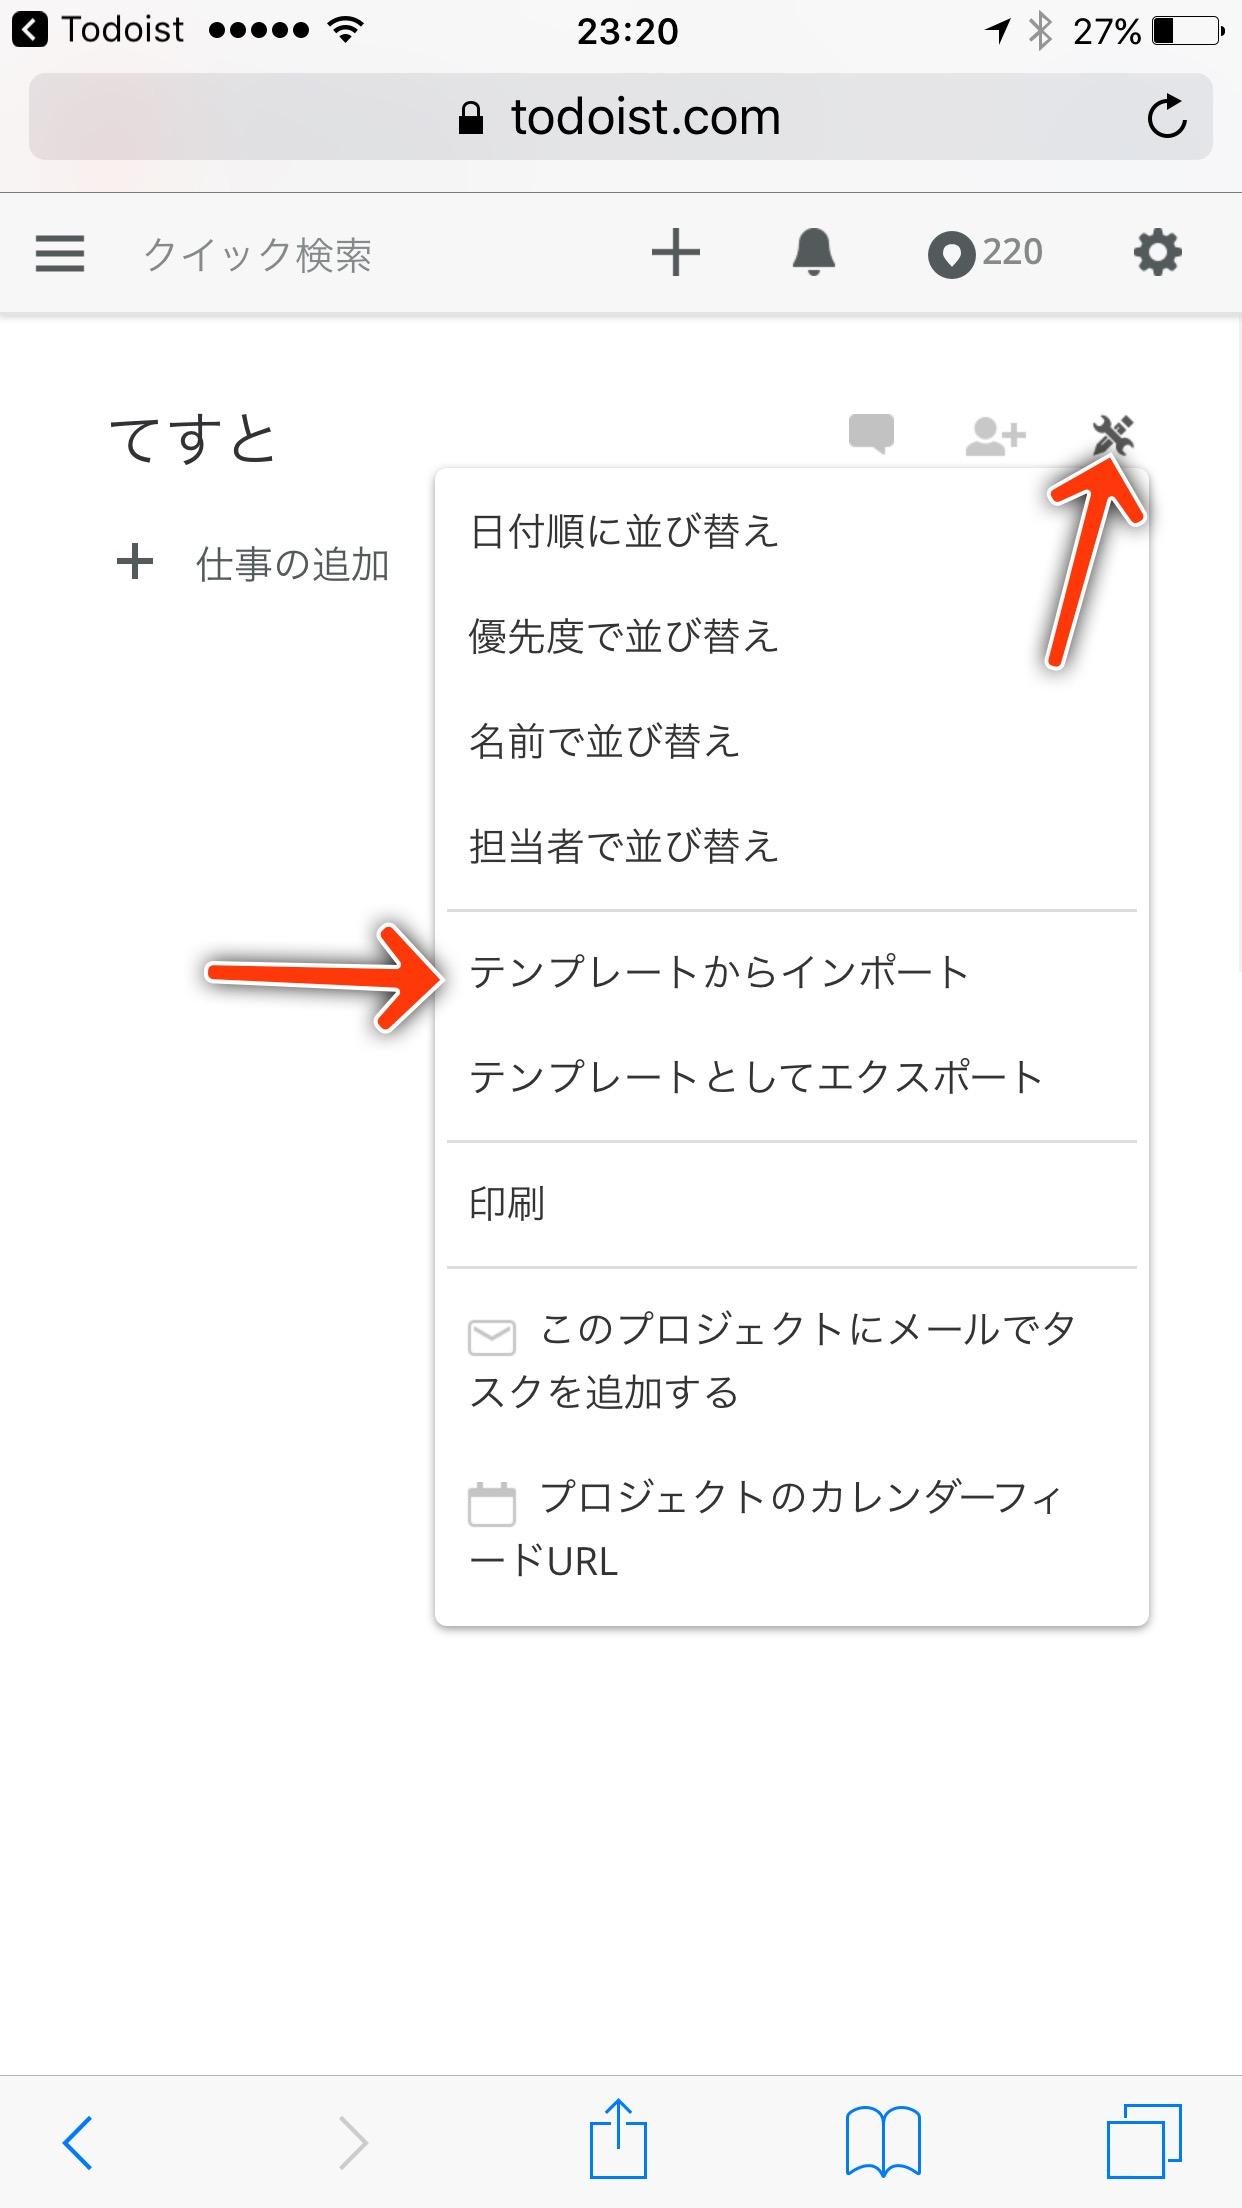 f:id:sorashima:20170331232956j:plain:w311